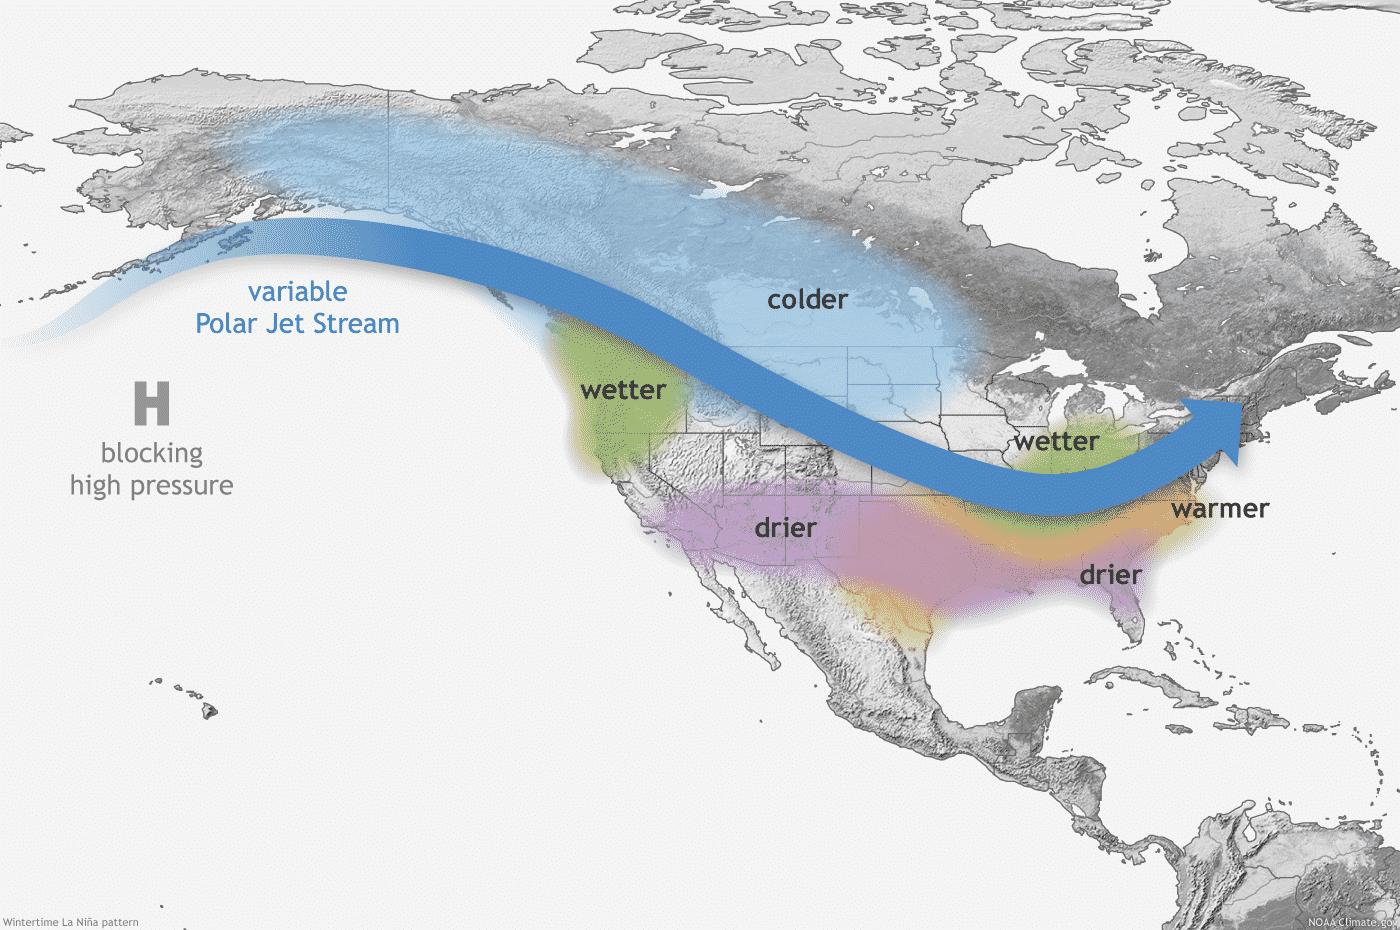 winter-forecast-season-la-nina-jet-stream-pattern-united-states-canada